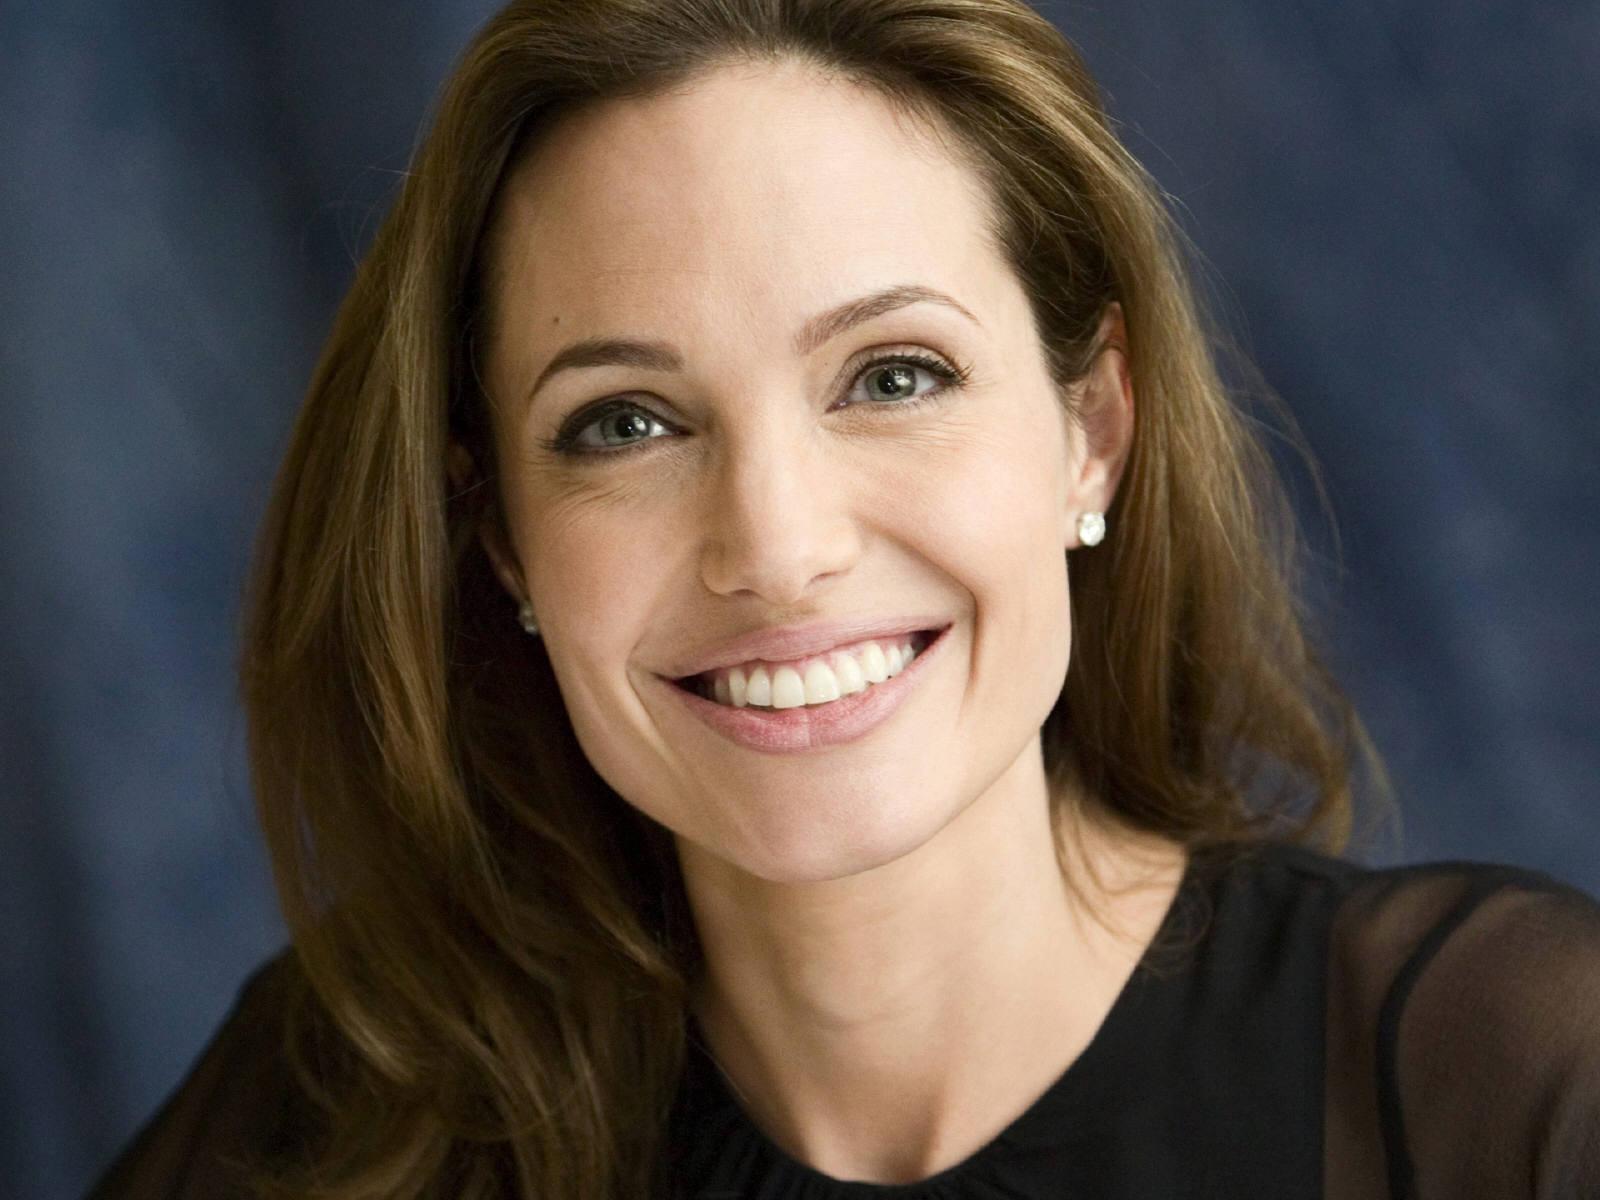 Free Landscape Wallpaper Hd Angelina Jolie Smile Wallpaper 50330 1600x1200px